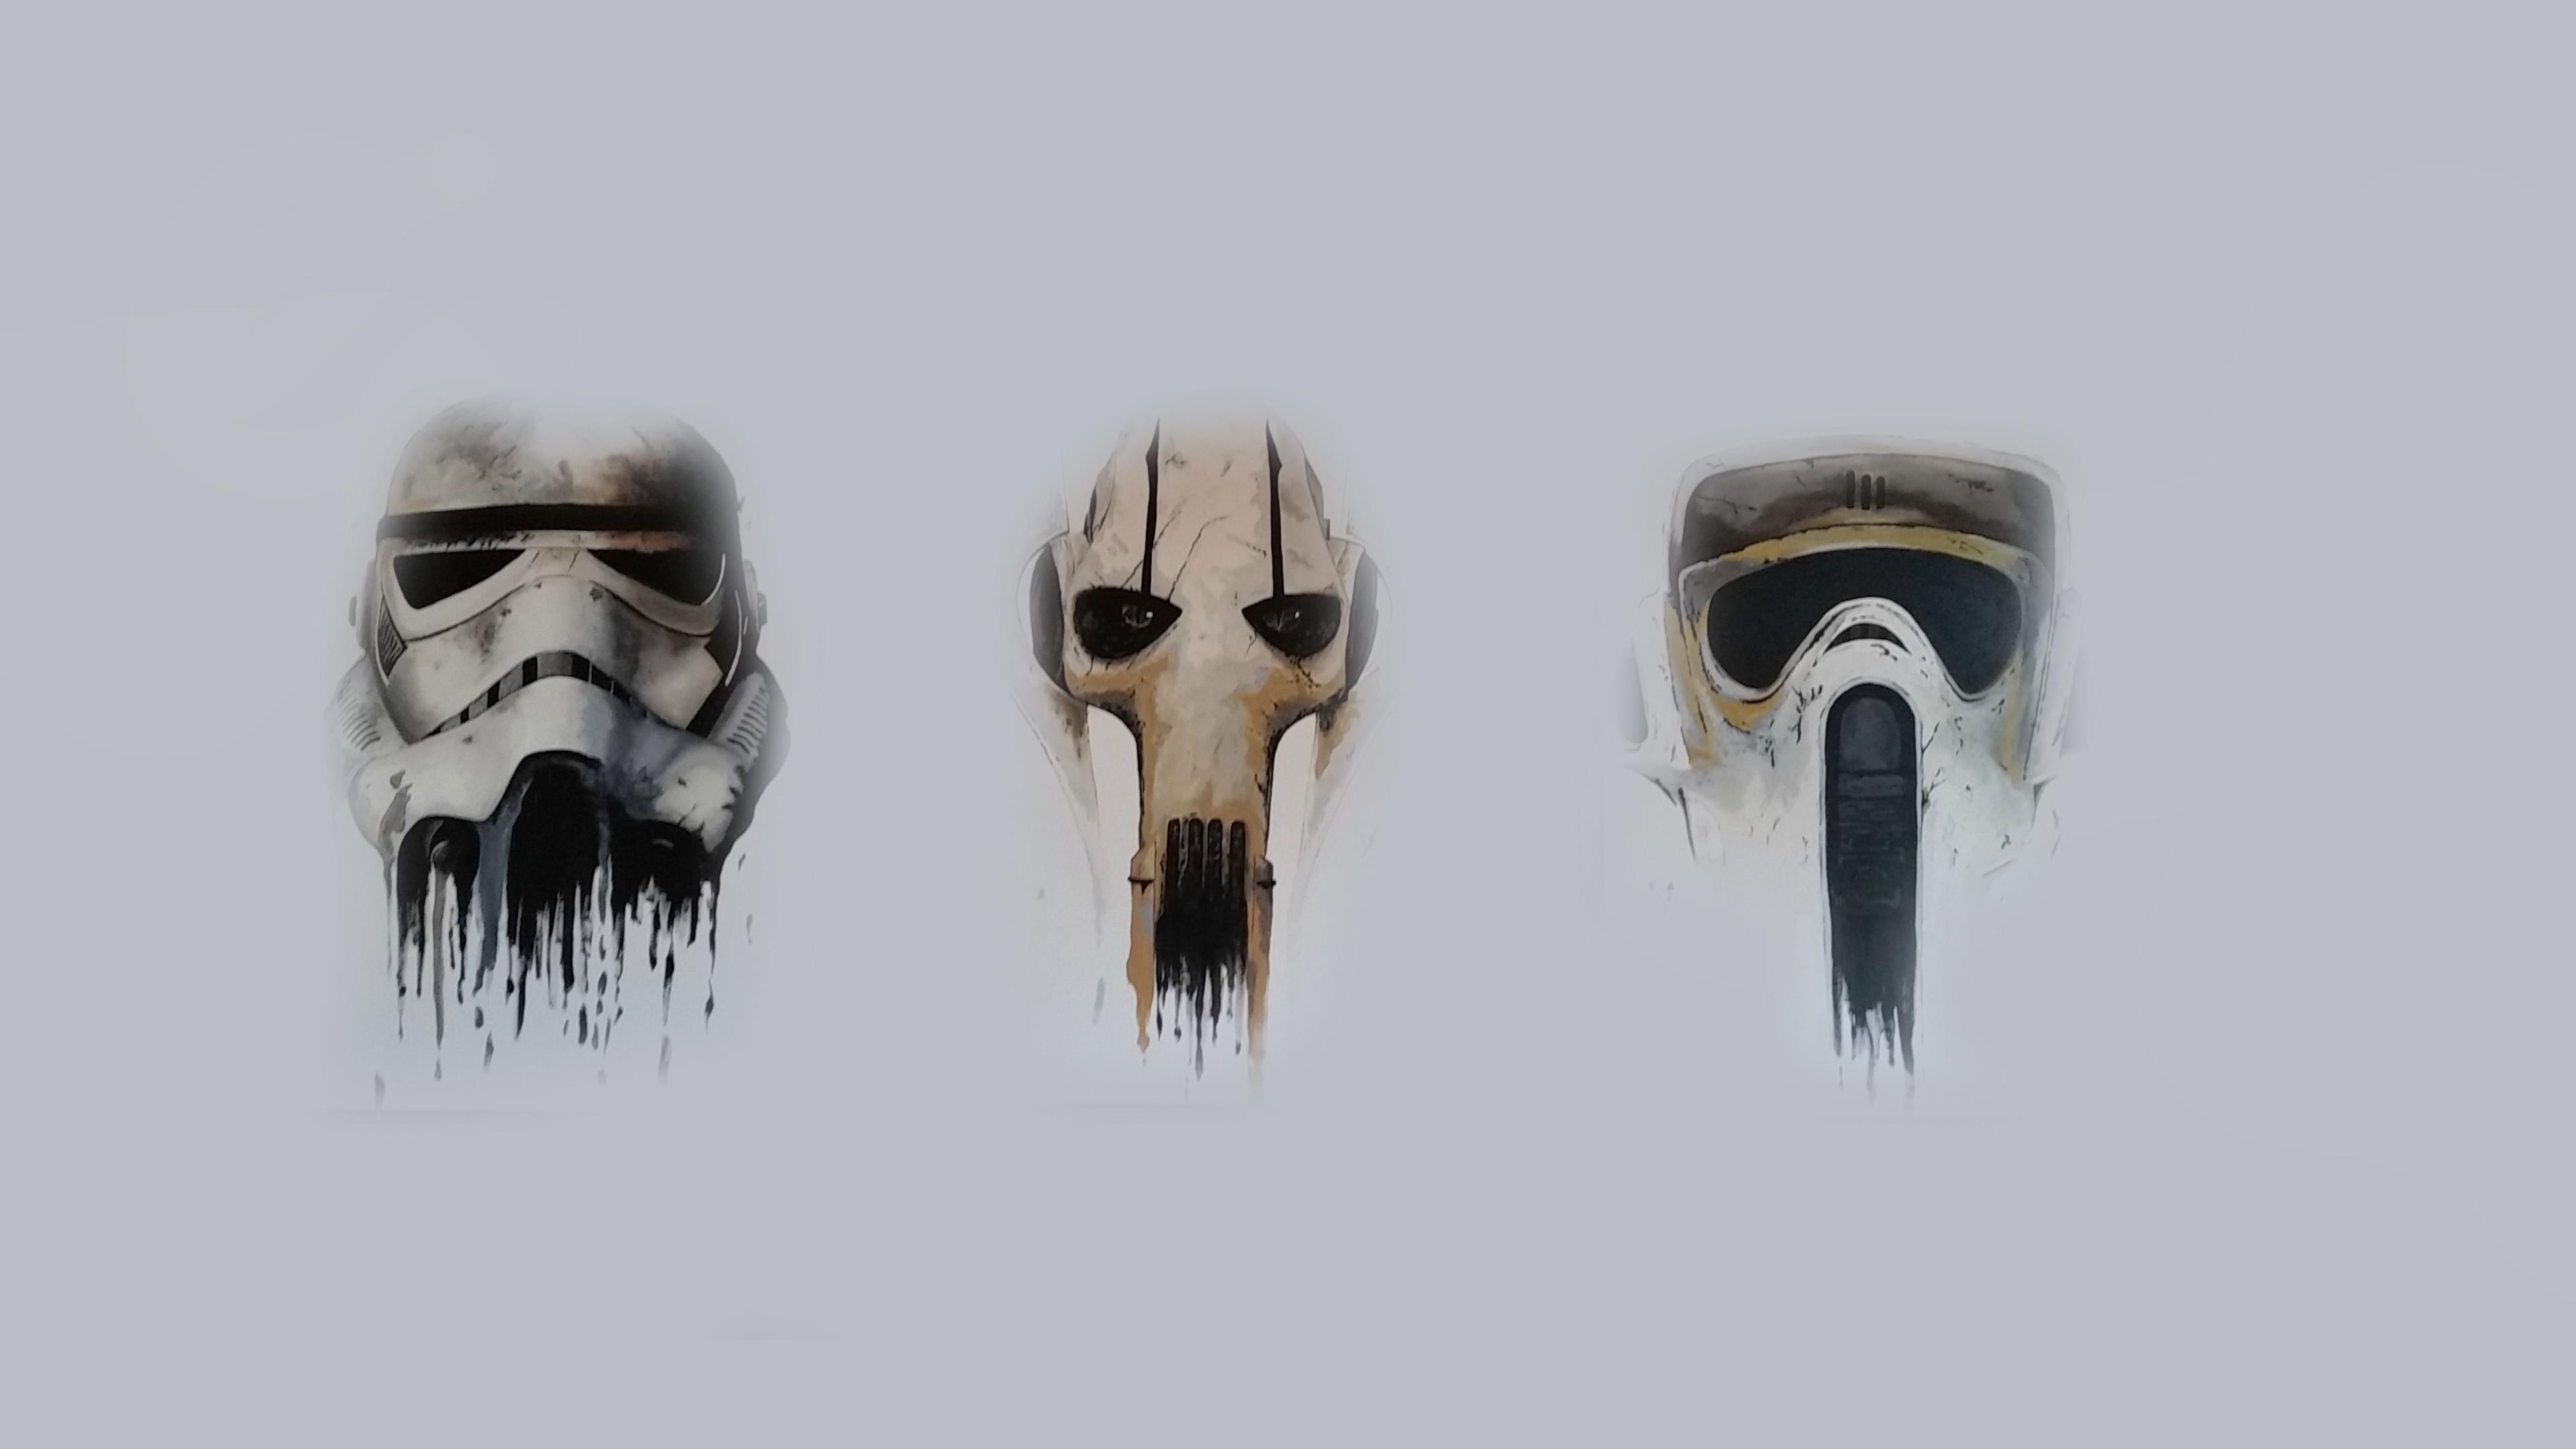 Sci Fi – Star Wars Helmet Wallpaper